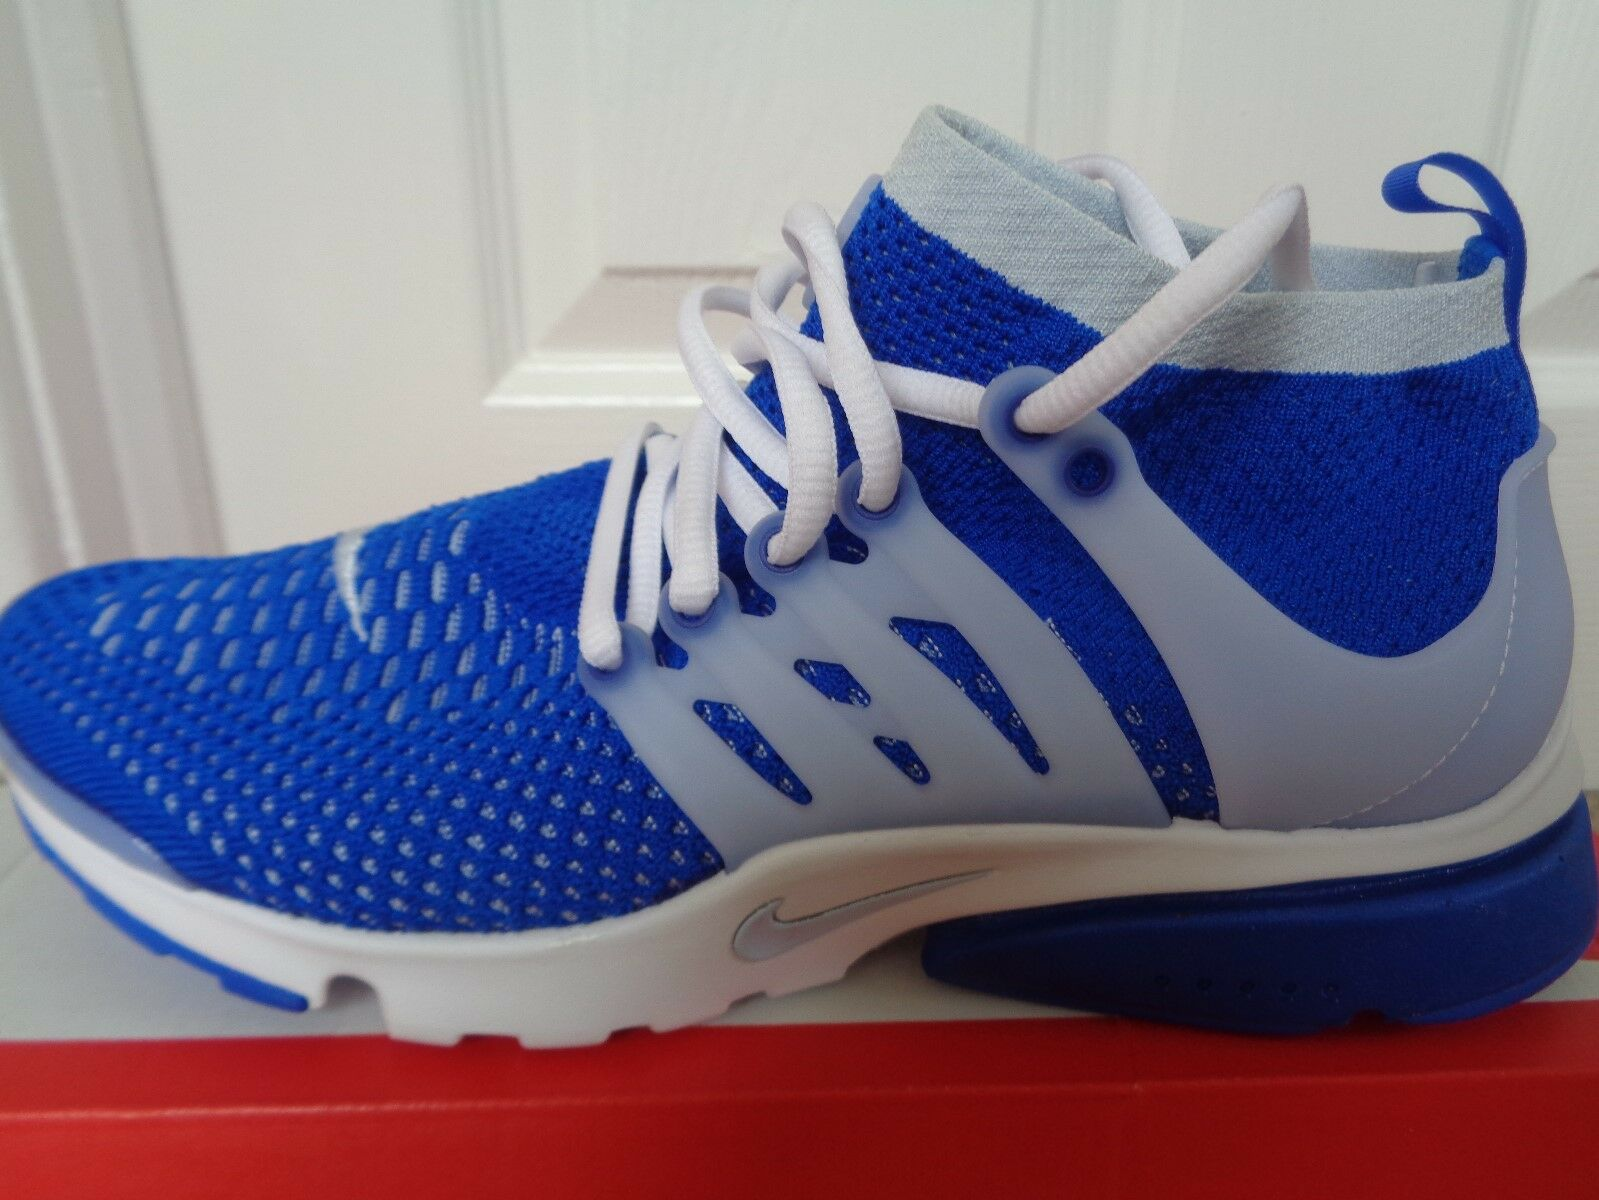 Nike Air Presto flyknit ultra trainers sneakers 835570 403 uk 10 eu 45 us 11 NEW